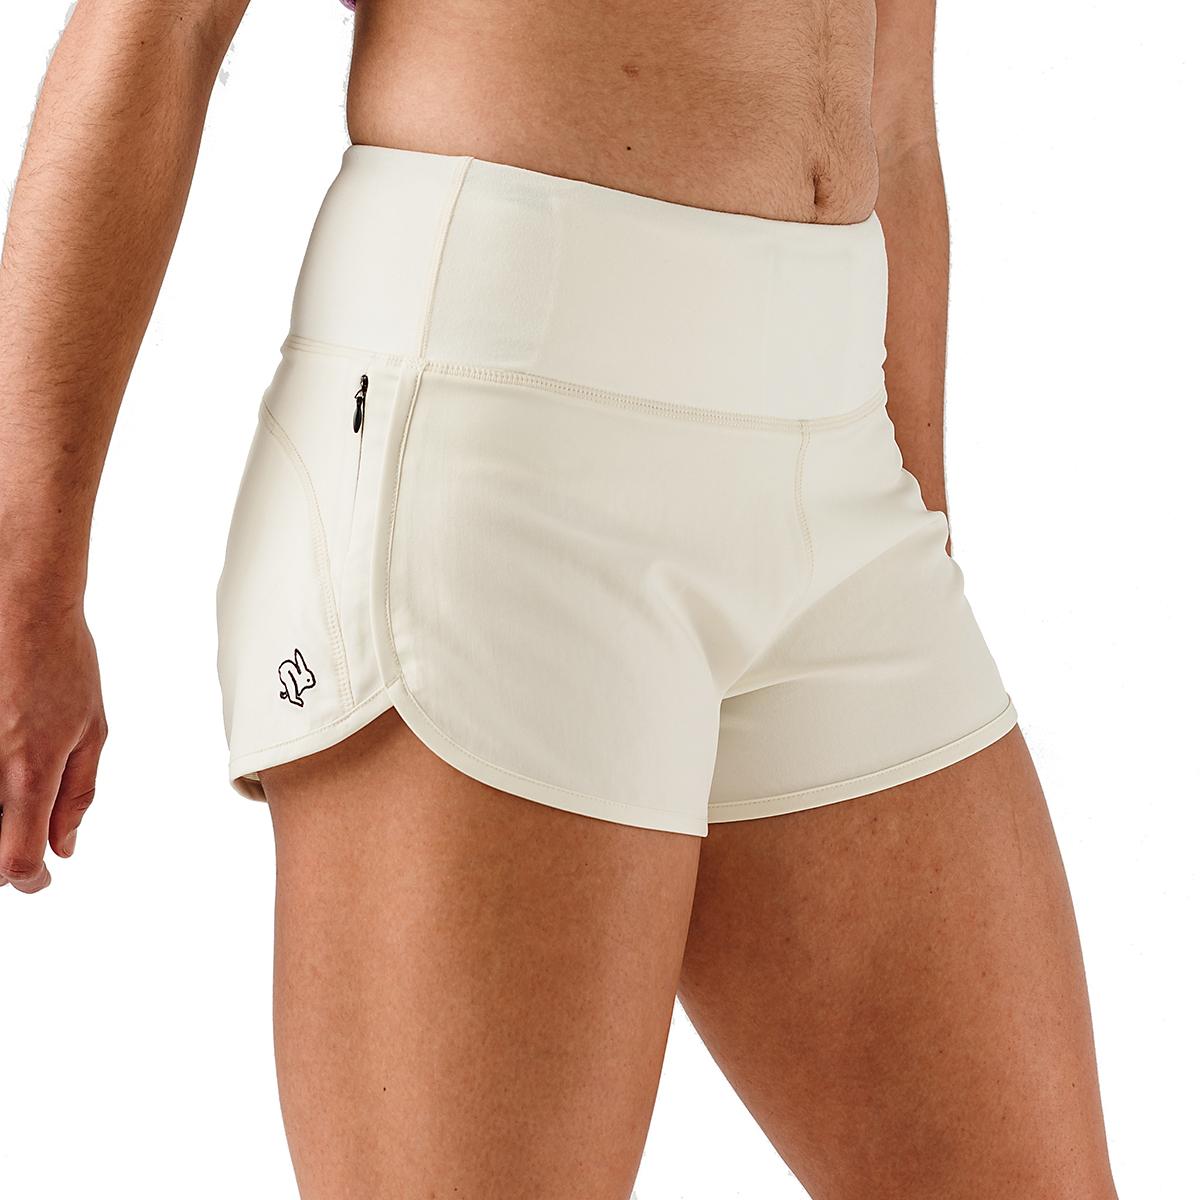 "Women's Rabbit Pocket Shorts 2.5"" - Color: Vanilla Ice - Size: XS, Vanilla Ice, large, image 3"